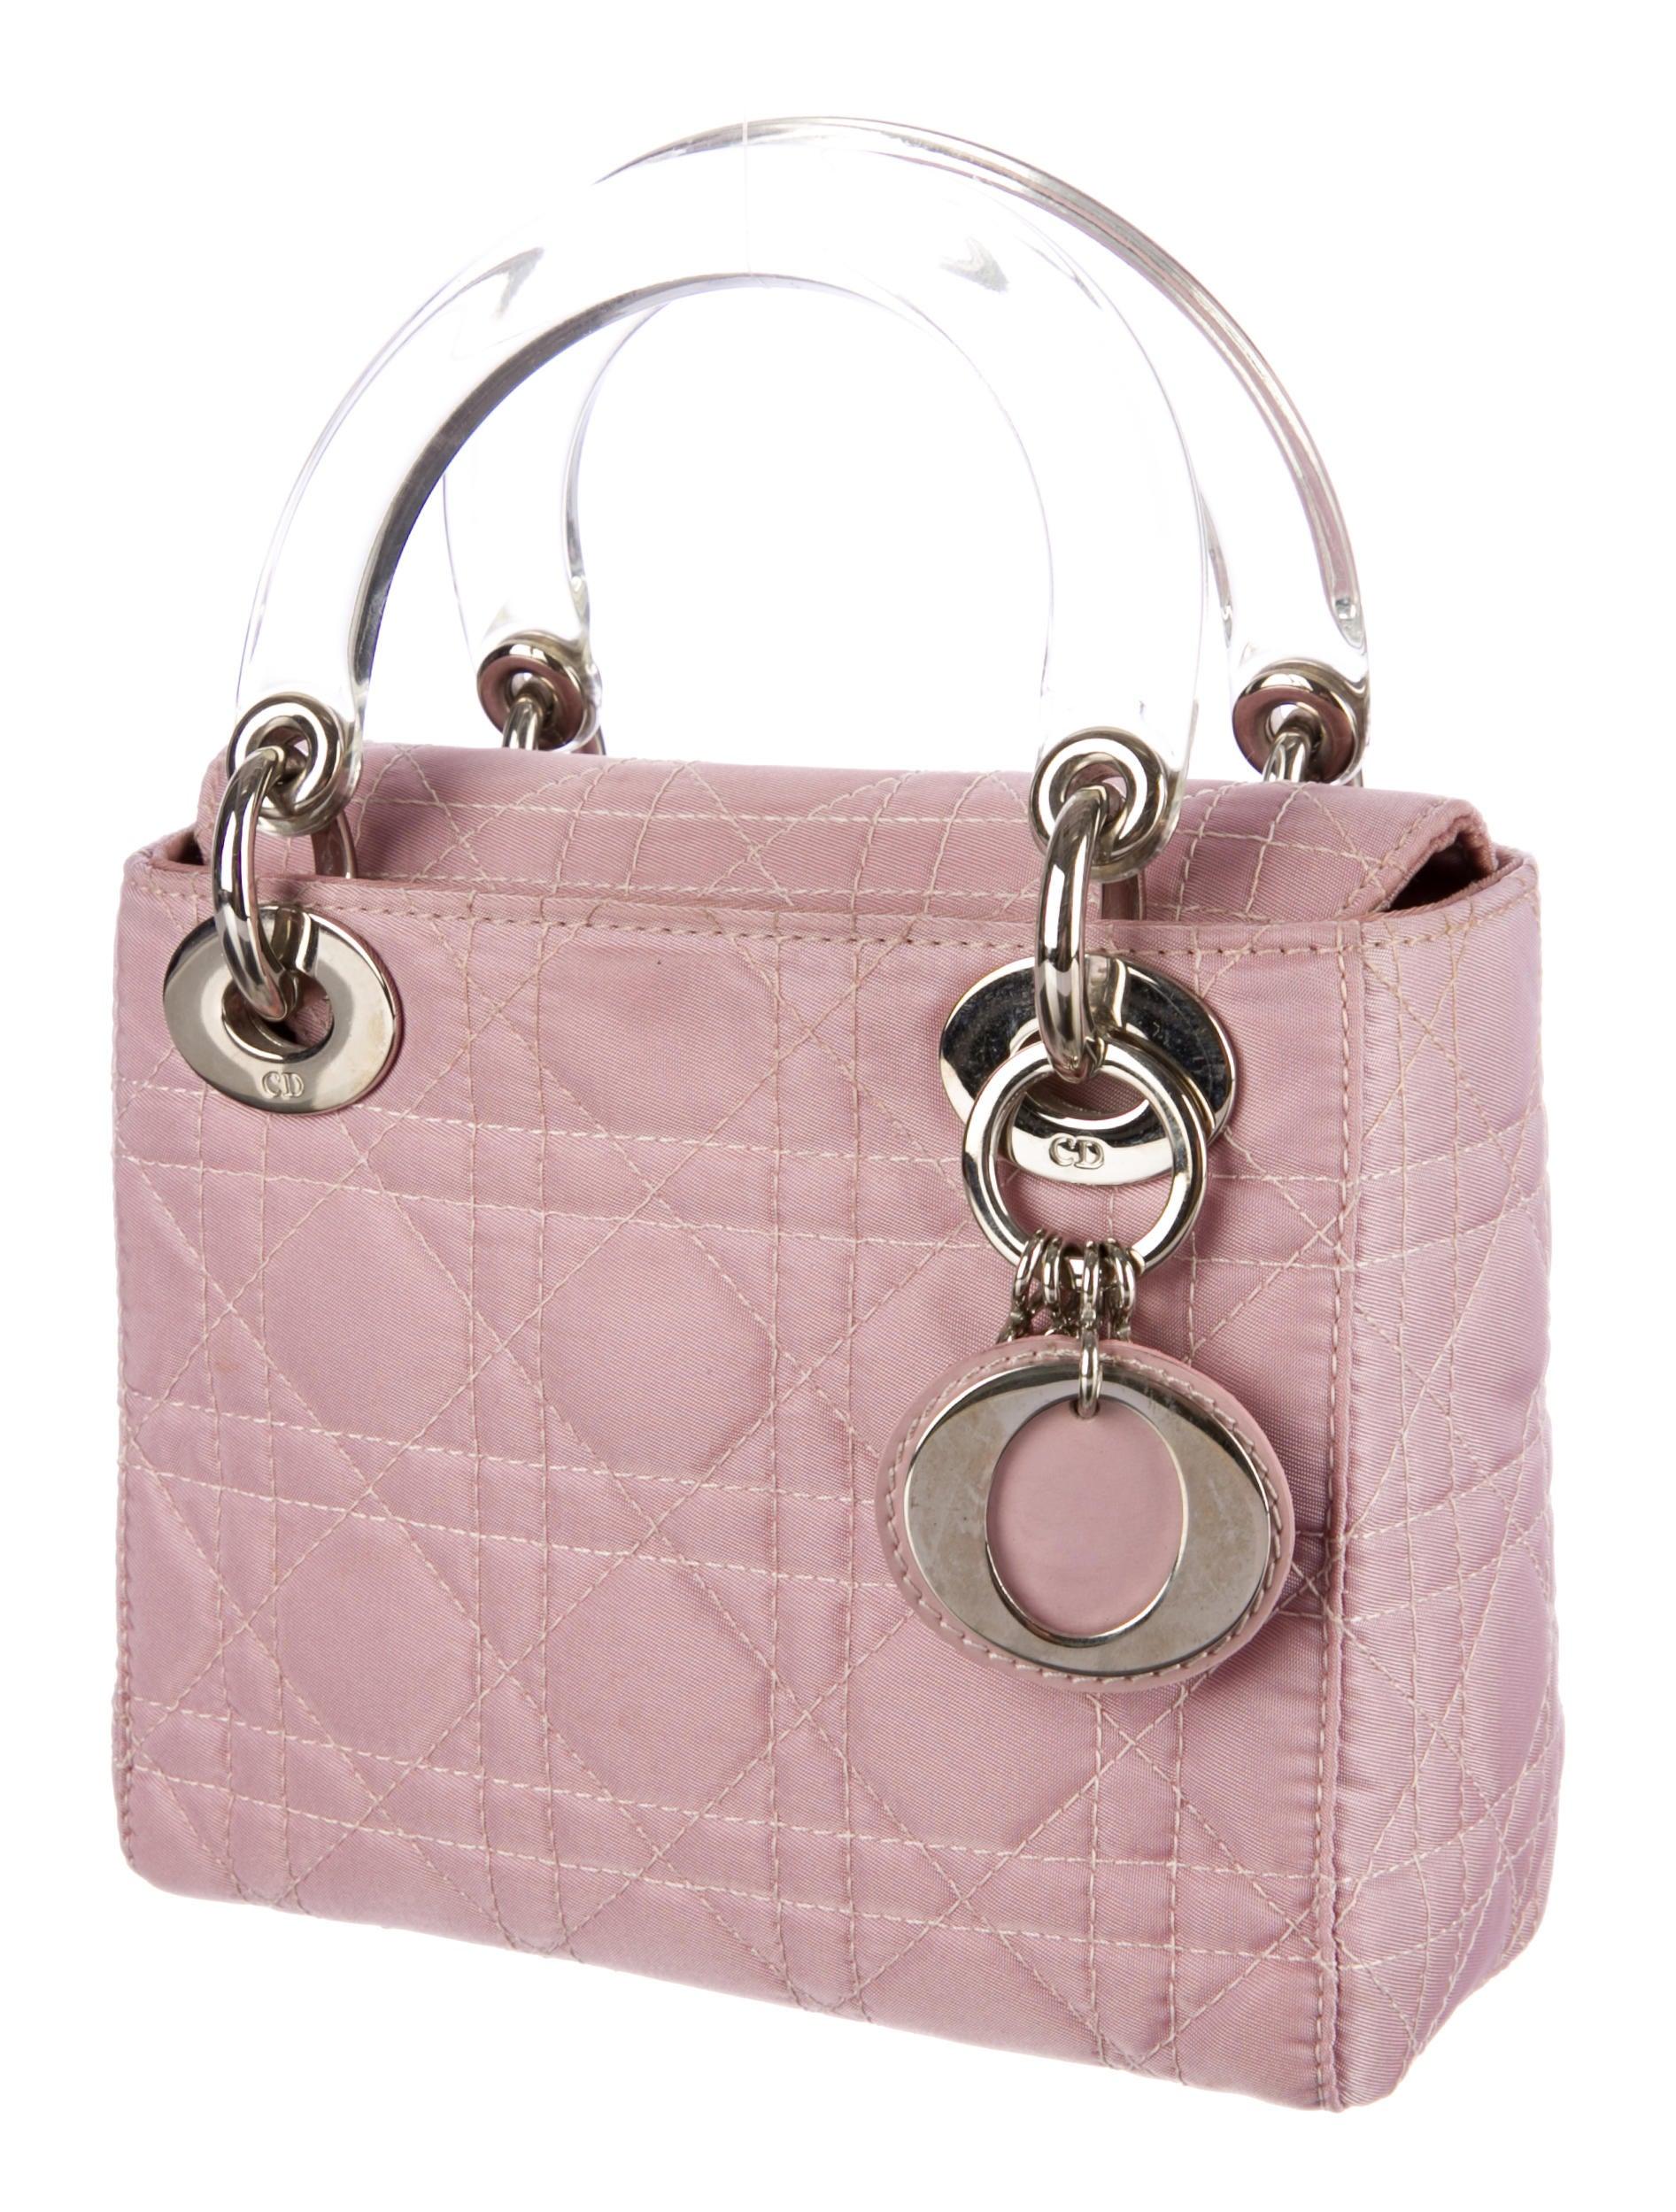 christian dior mini lady dior bag handbags chr33479 the realreal. Black Bedroom Furniture Sets. Home Design Ideas